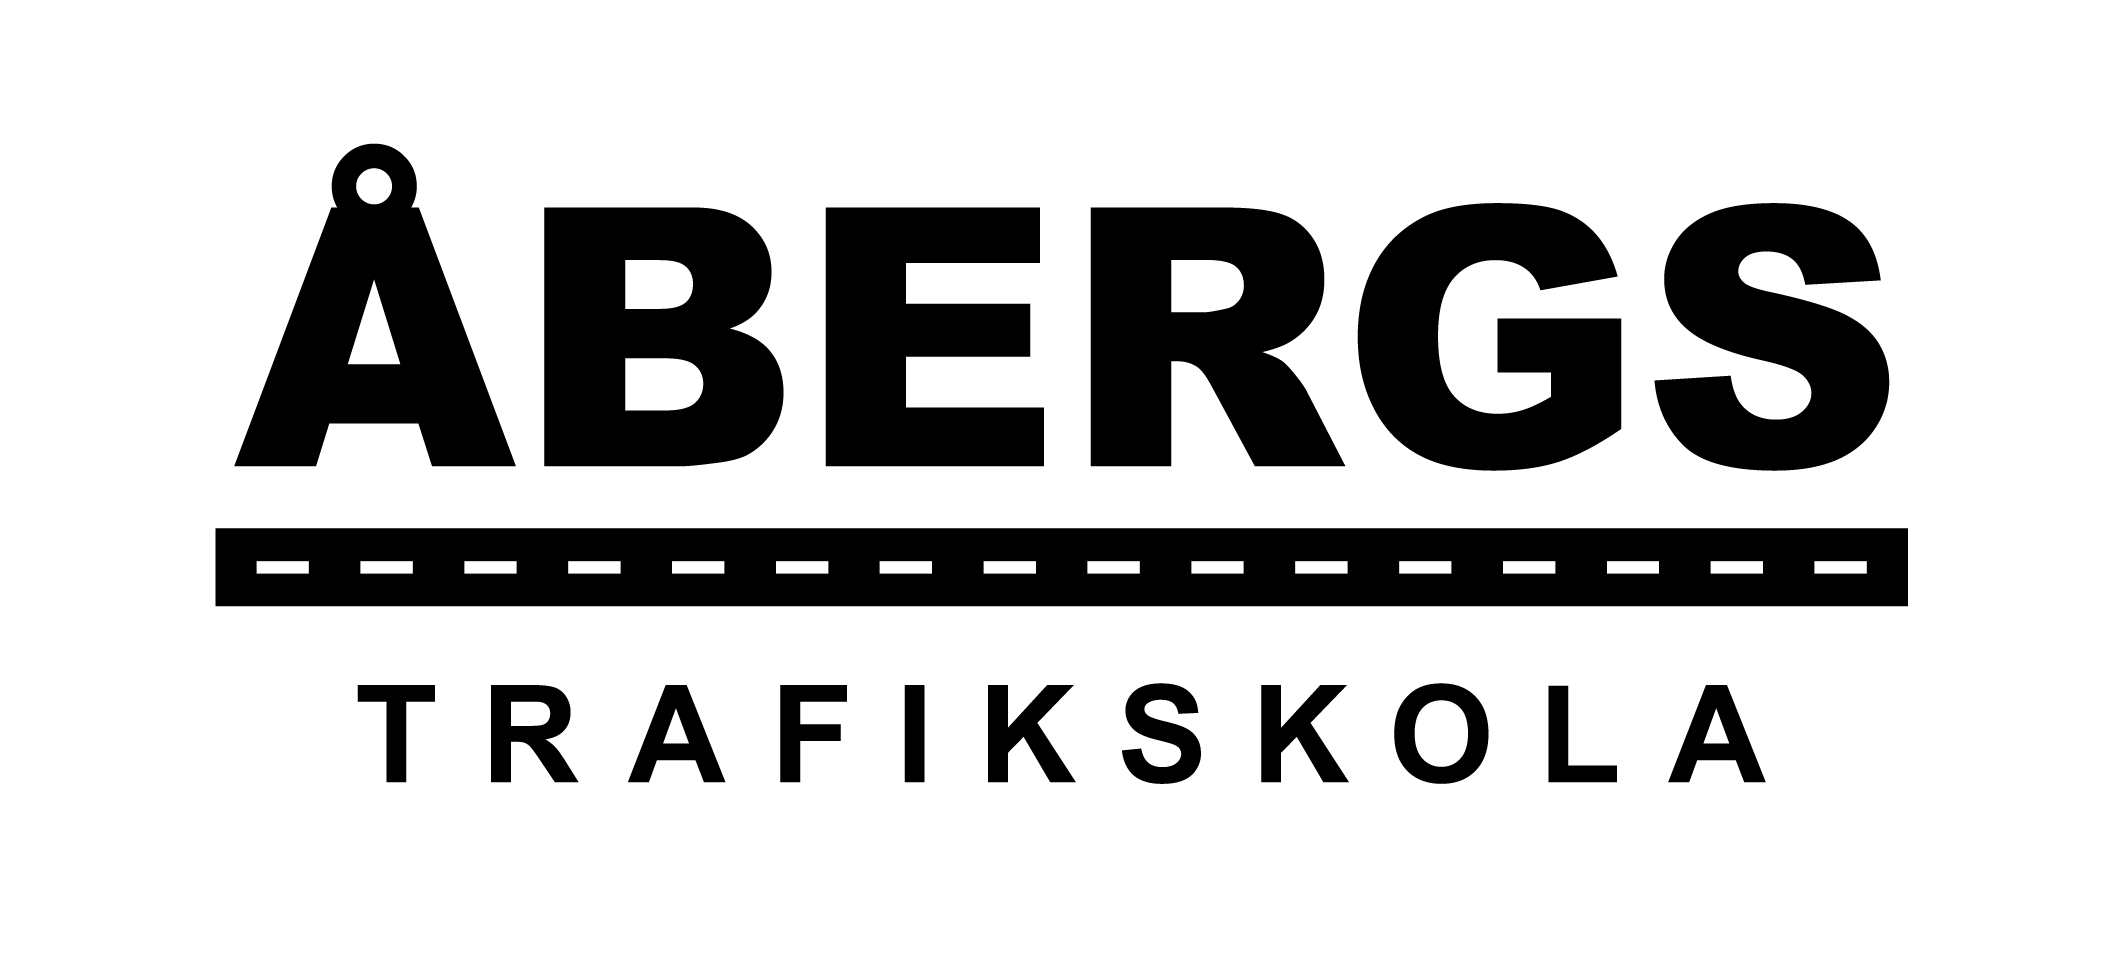 abergs_logotyp_